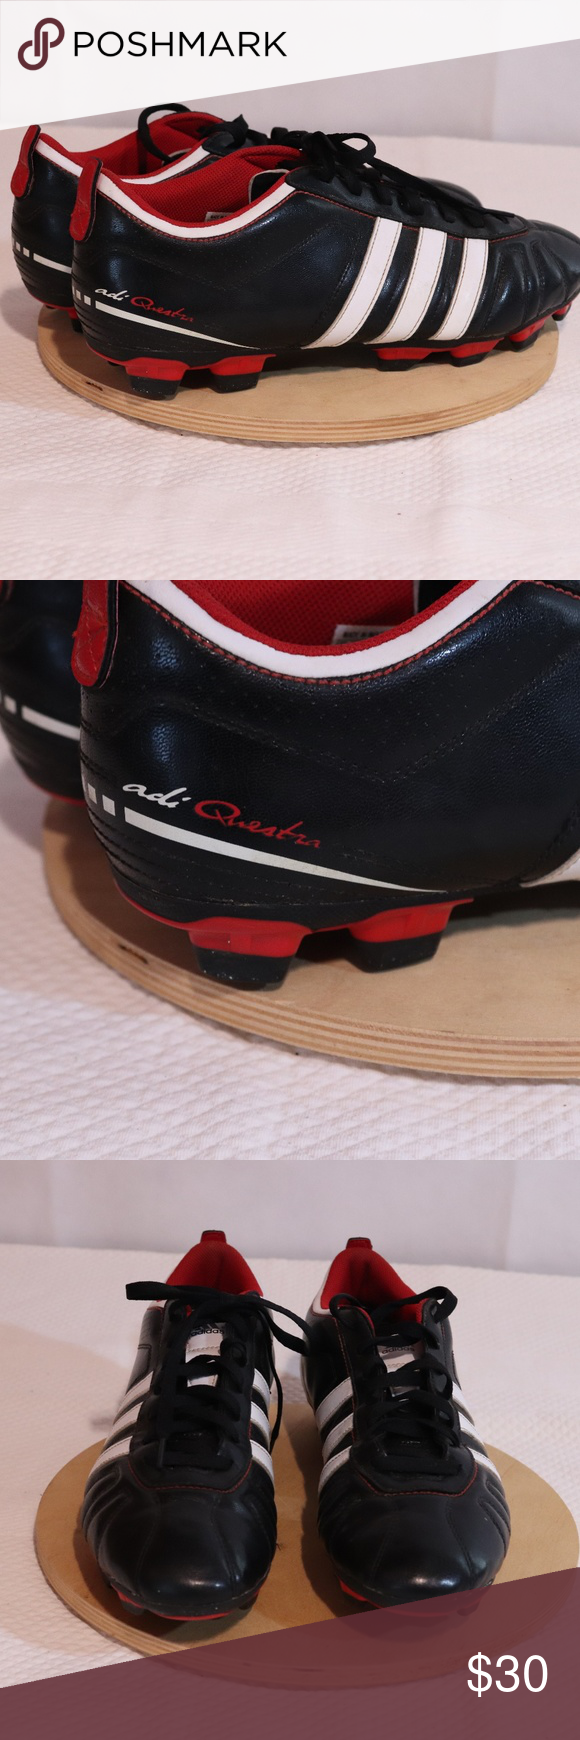 14d066b4d Adidas AdiQuestra IV TRX Soccer Cleats Size 12 ADIDAS  ADIQUESTRA IV TRX  FG  MENS